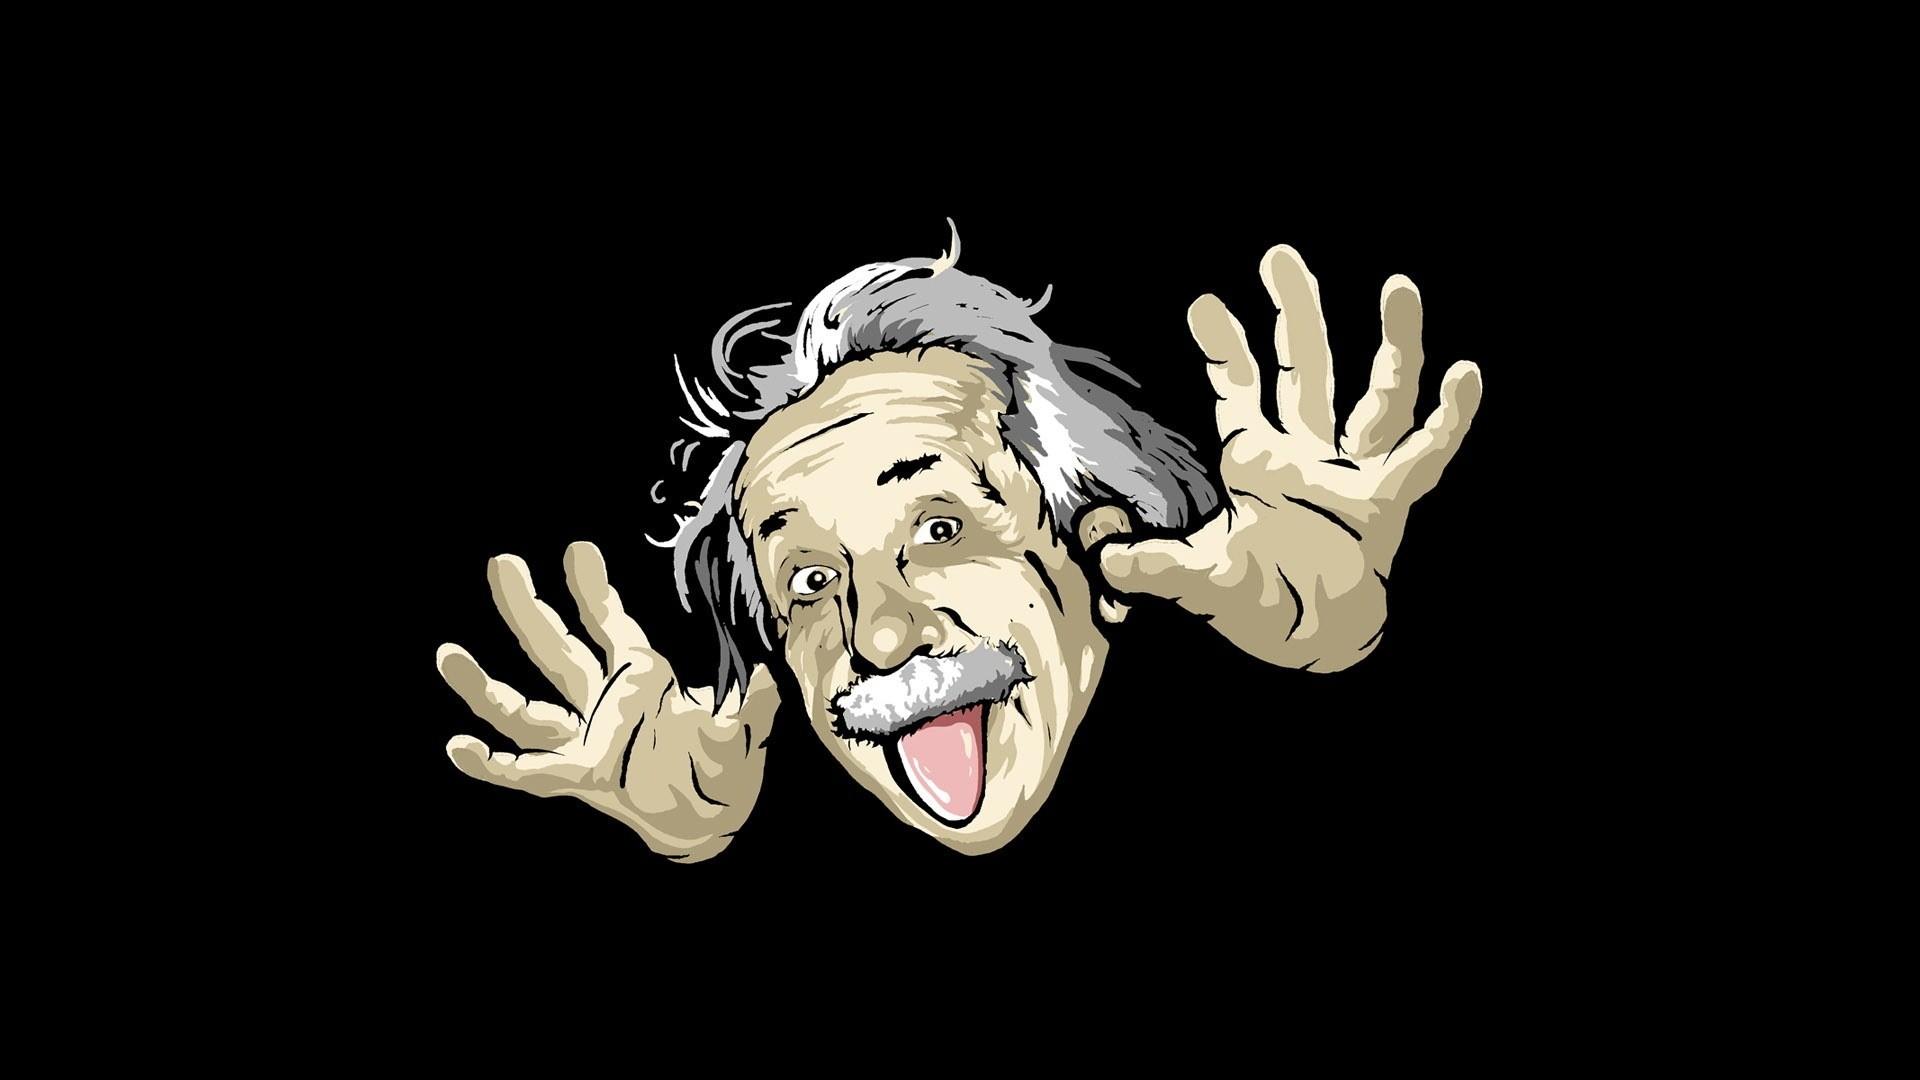 Albert Einstein vertical wallpaper hd